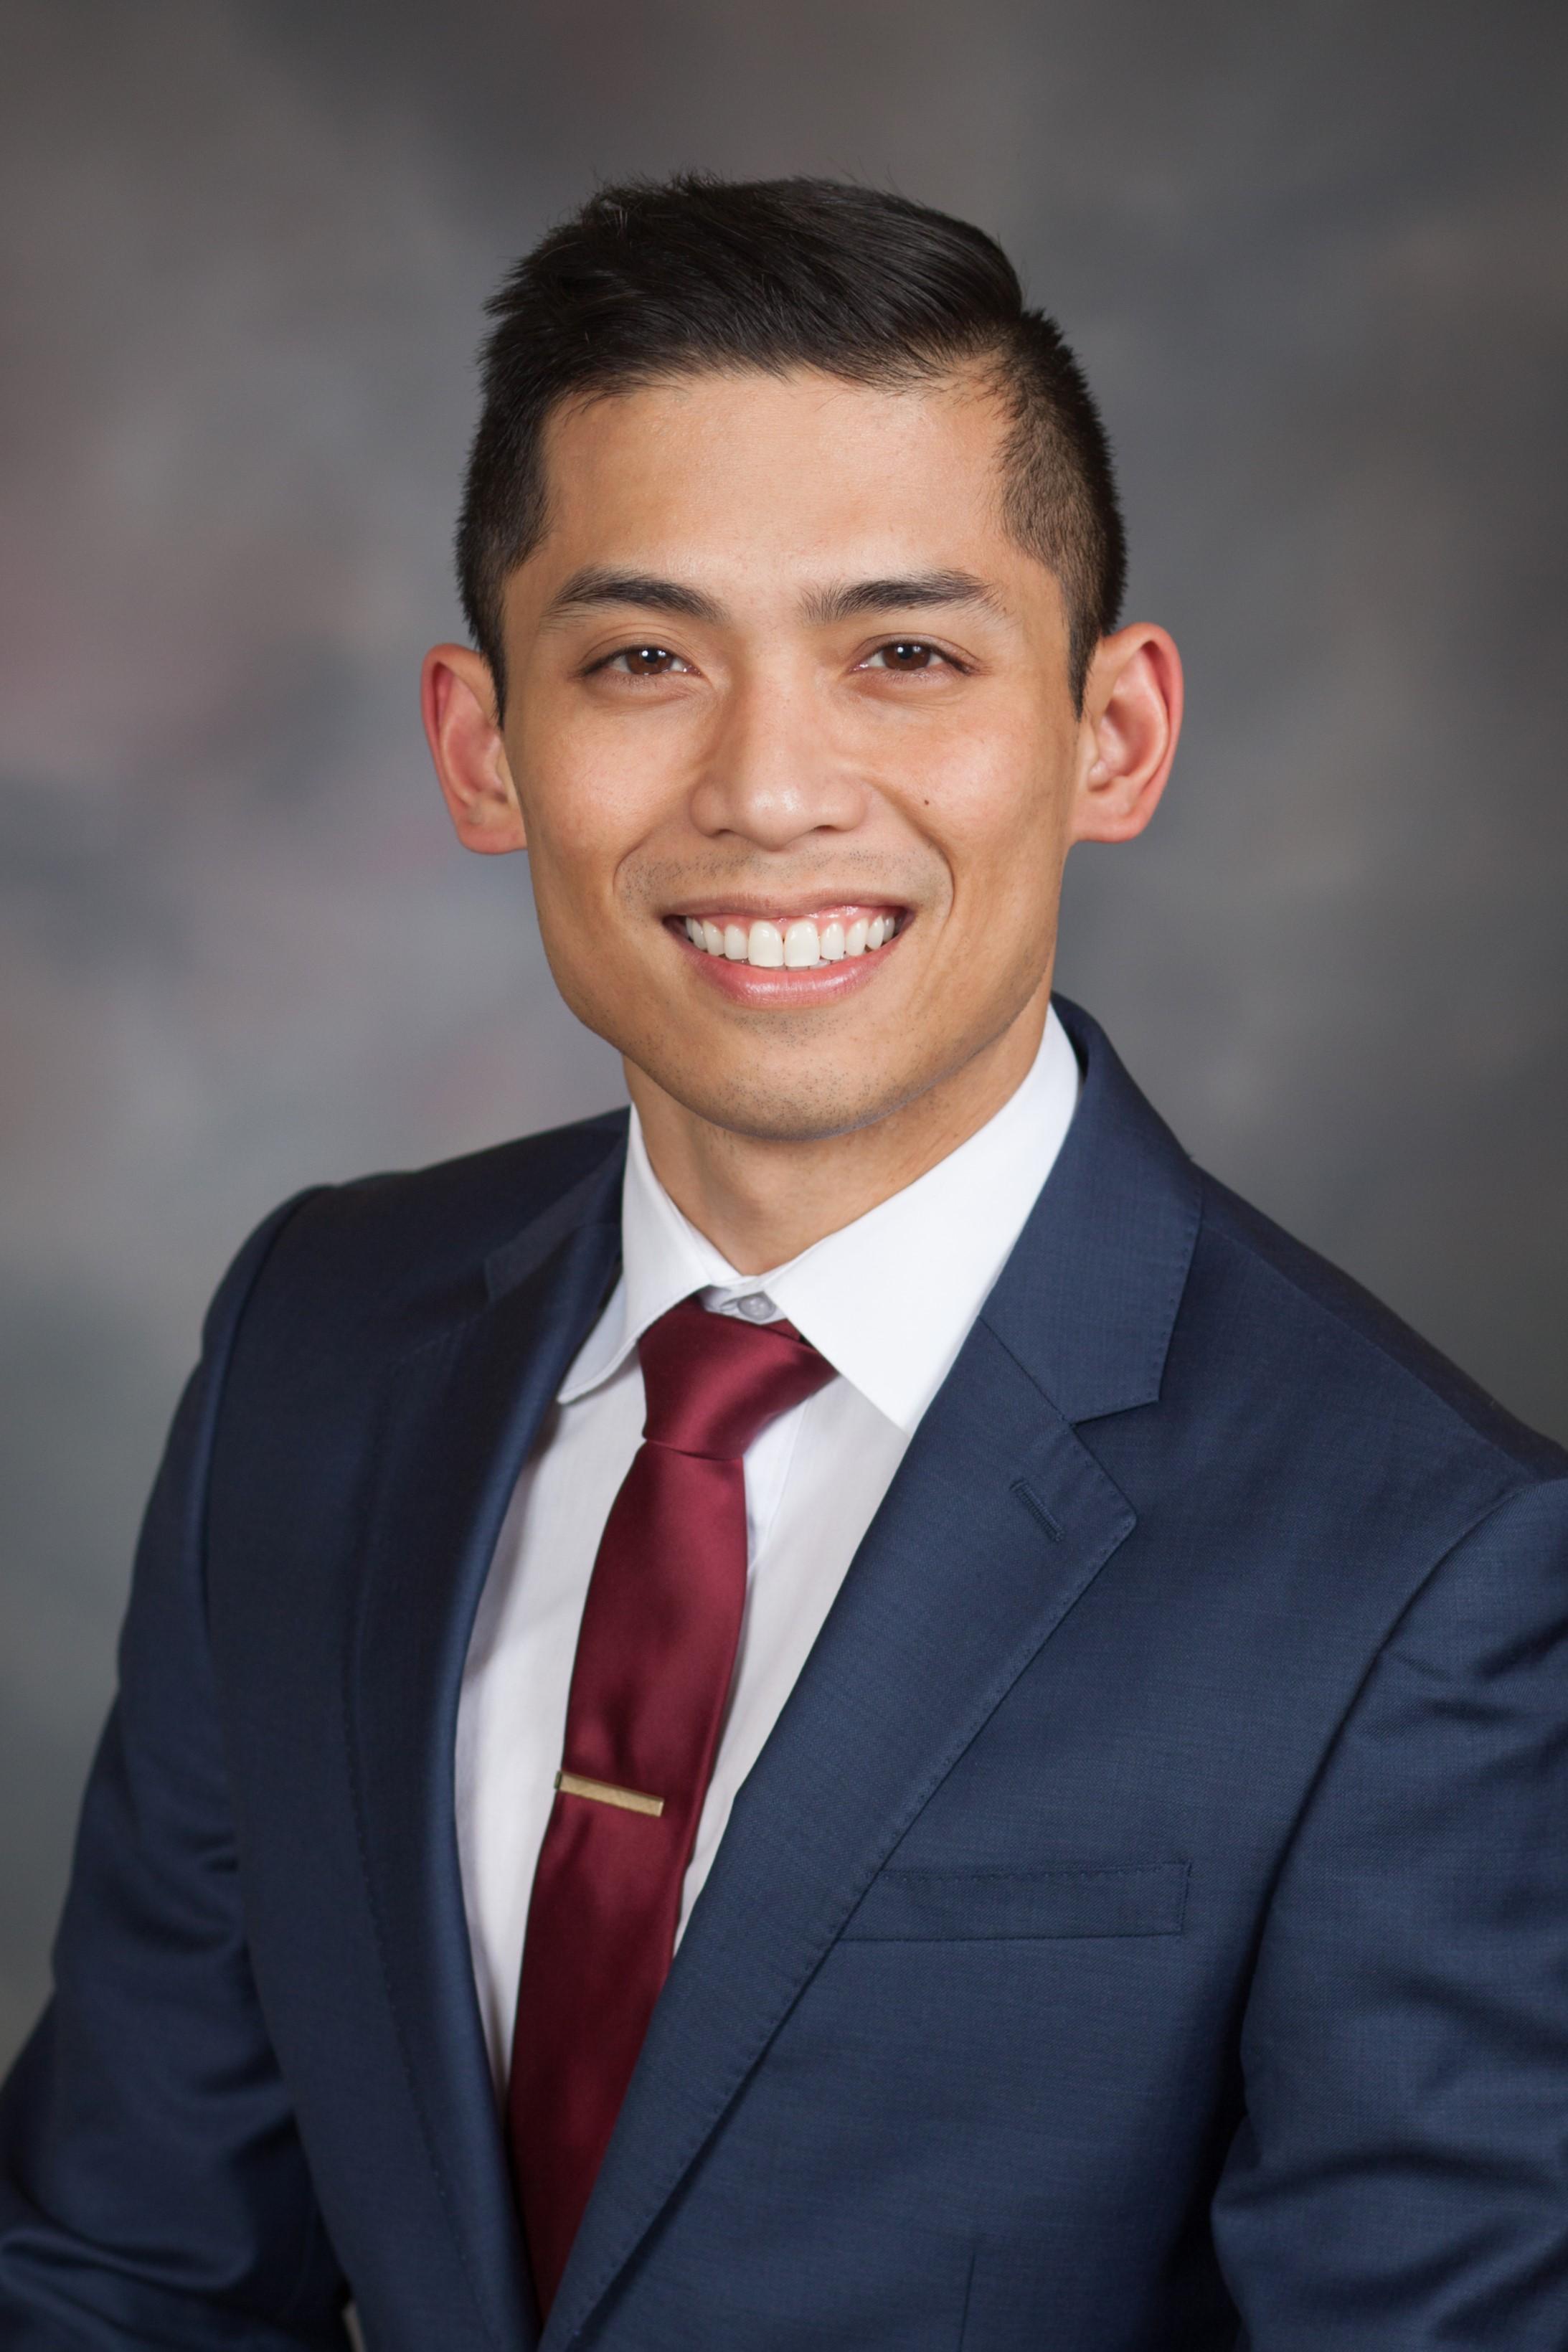 Antonio Moya, MD, MPH